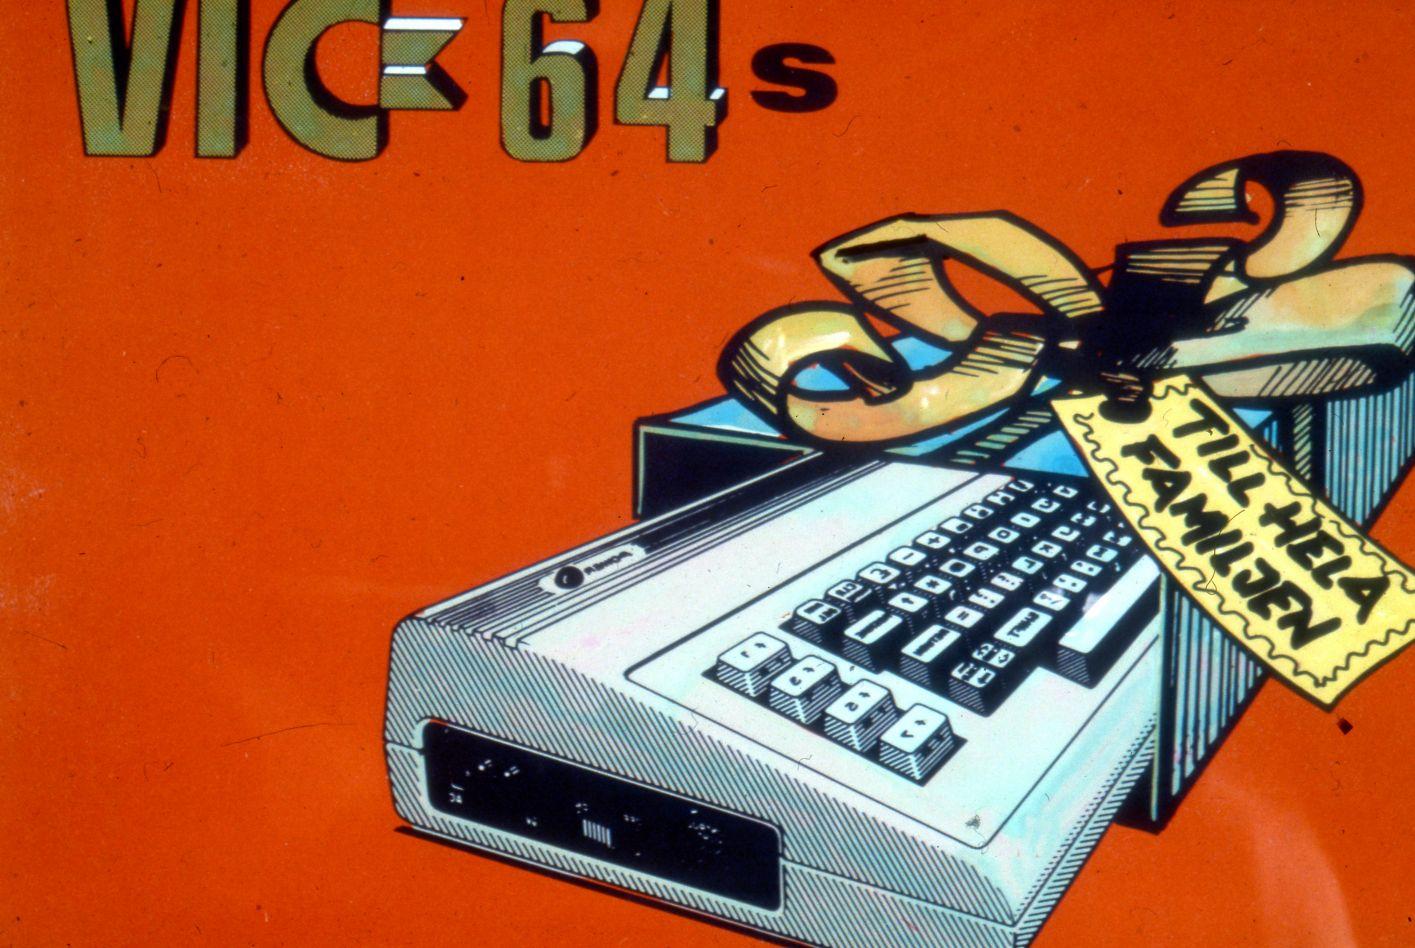 handic_byt_1983 (2)